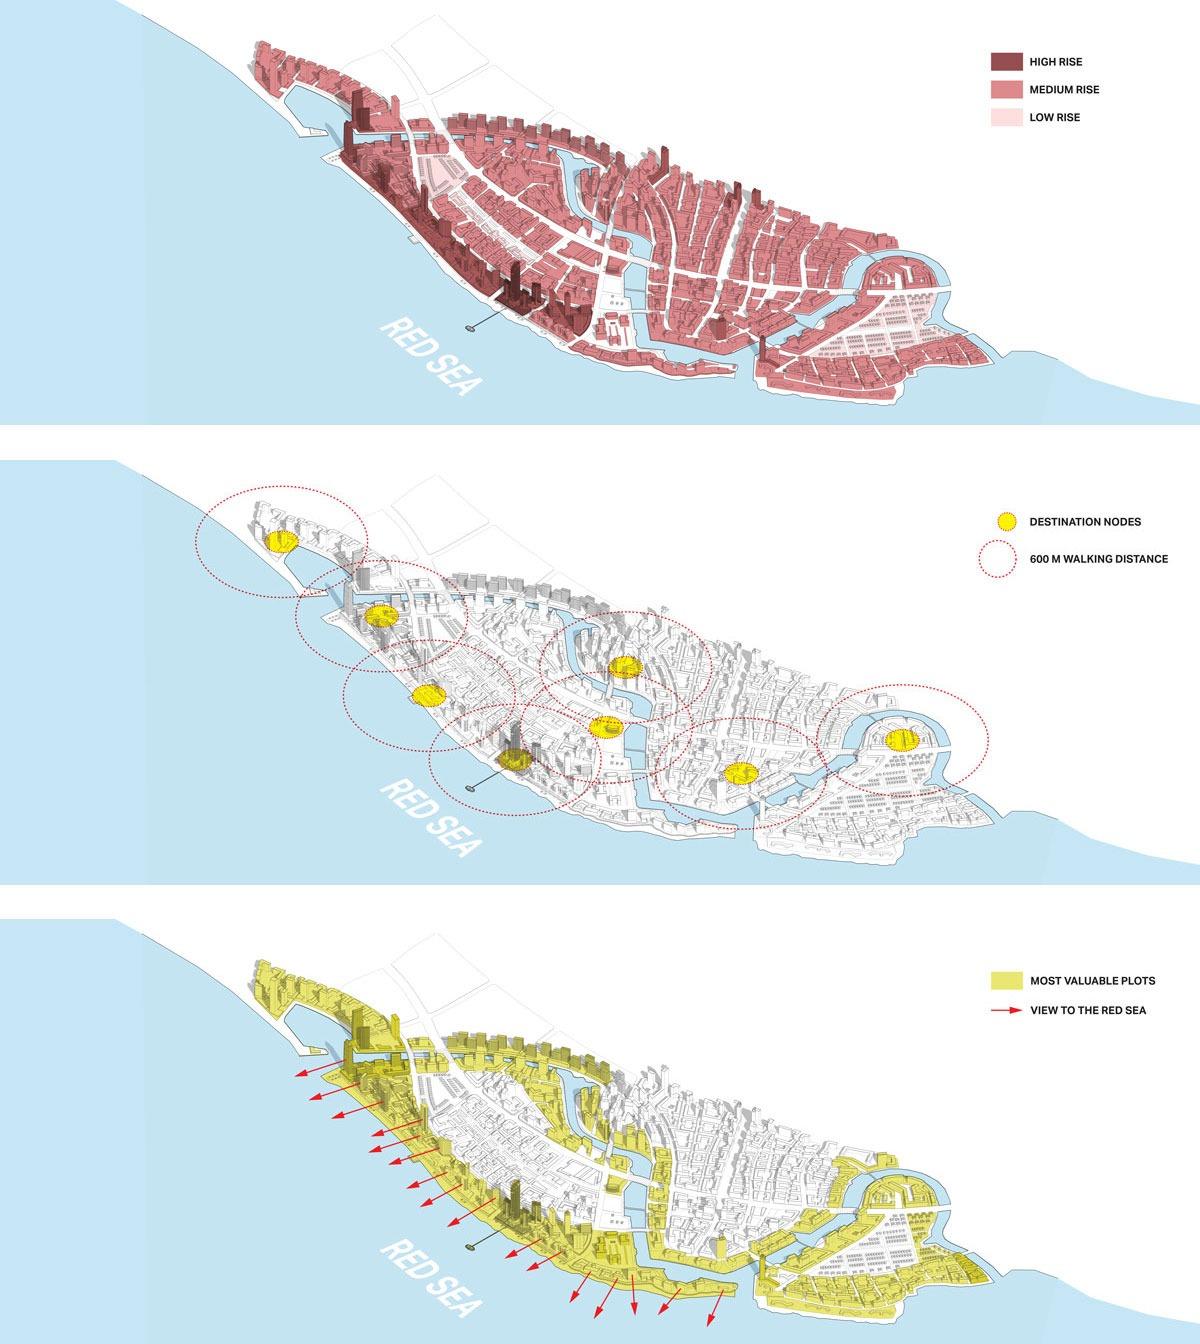 https://www.edgedesign.ae/wp-content/uploads/2019/07/Bay-La-Sun-Masterplan-KAEC-Diagrams.jpg